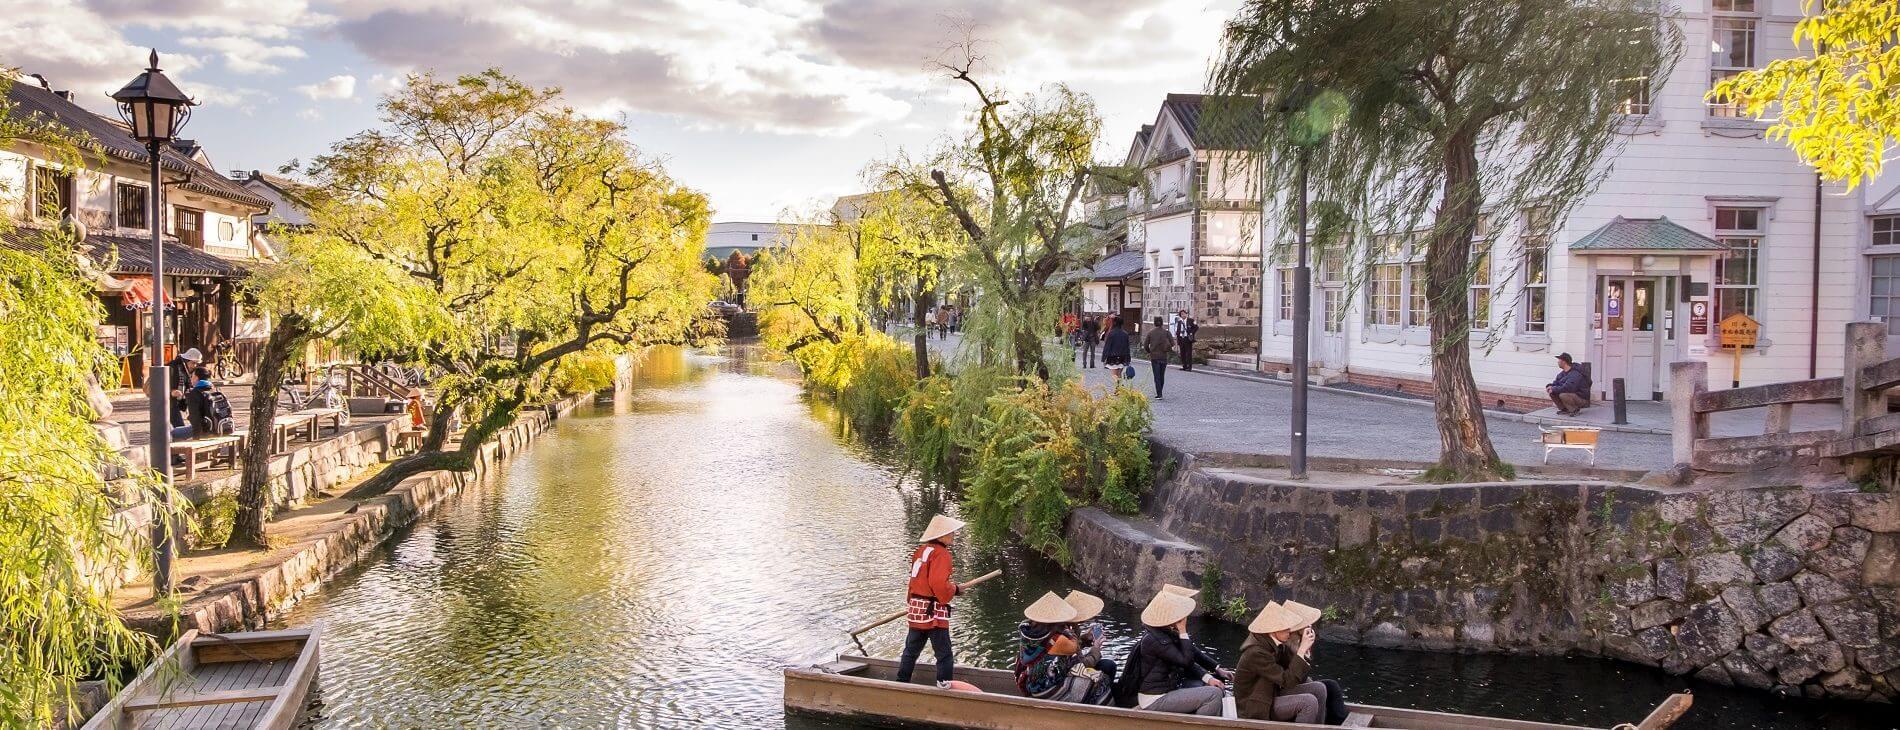 giatore-kurashiki-lake city japan at Kurashiki Bikan Historical Quarter, the Traditional Boat Tour of Kurashiki Canal Sailing through the center of town copertina